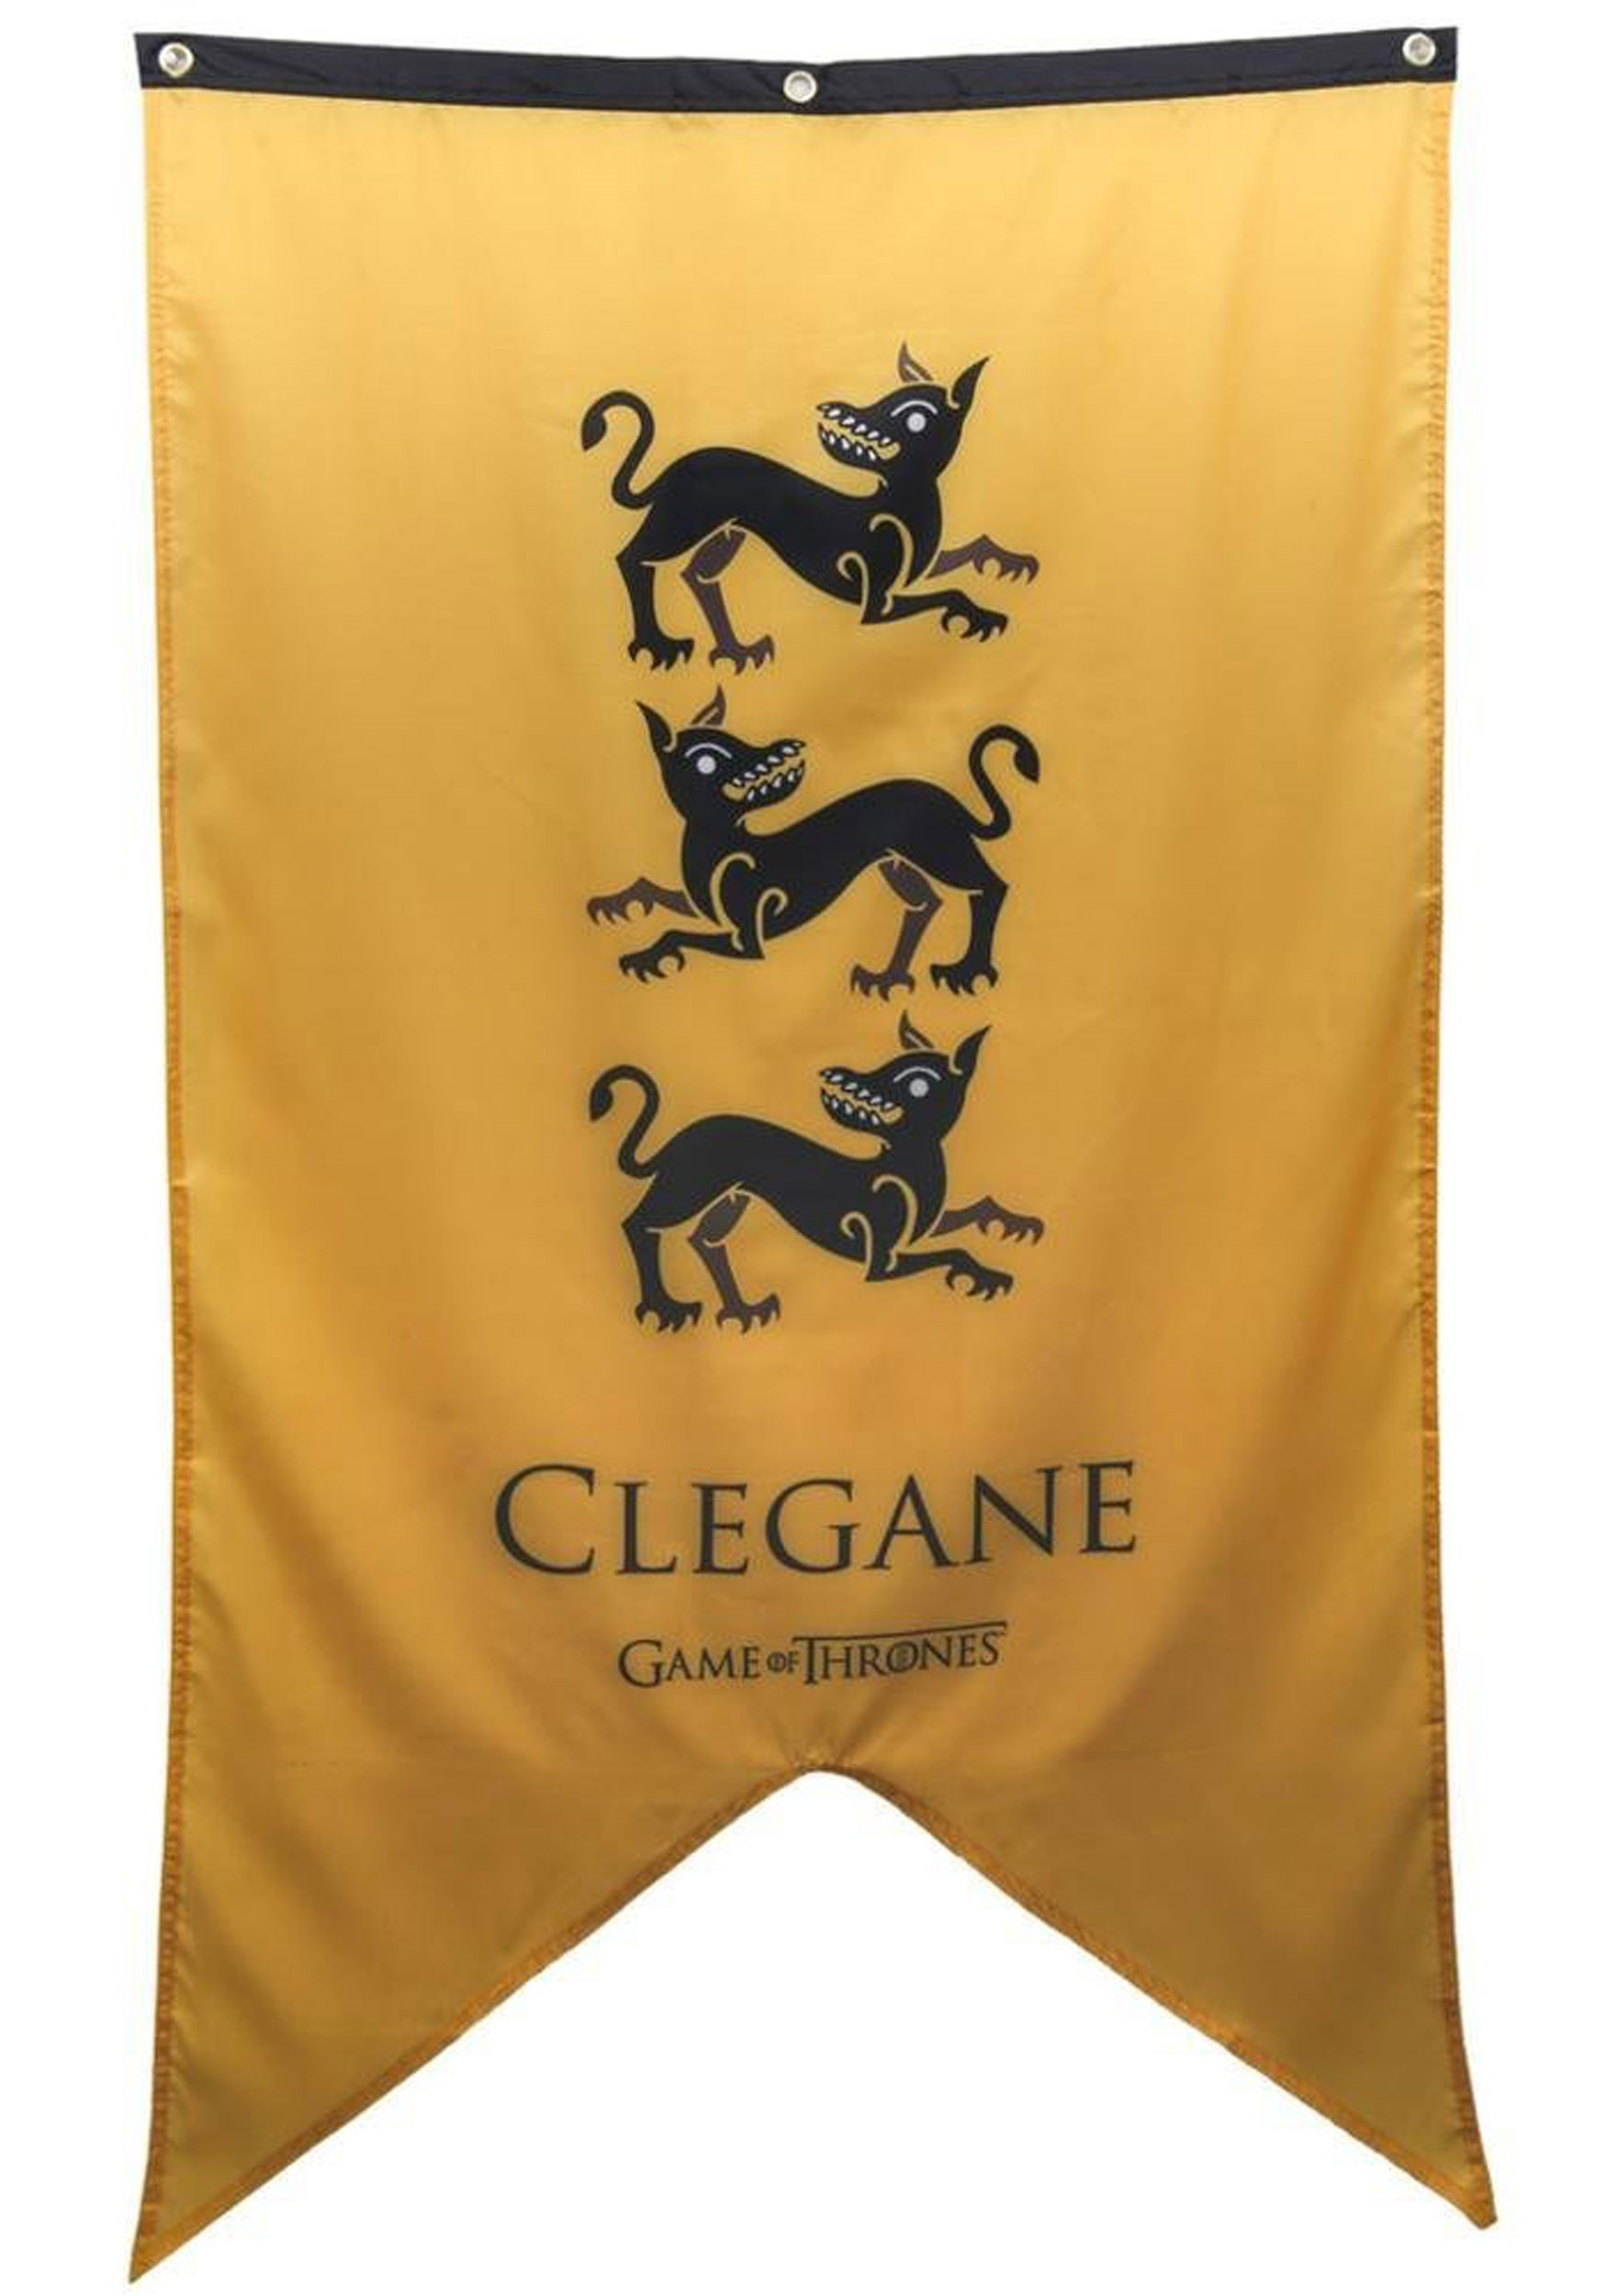 Game of Thrones Clegane Sigil Banner